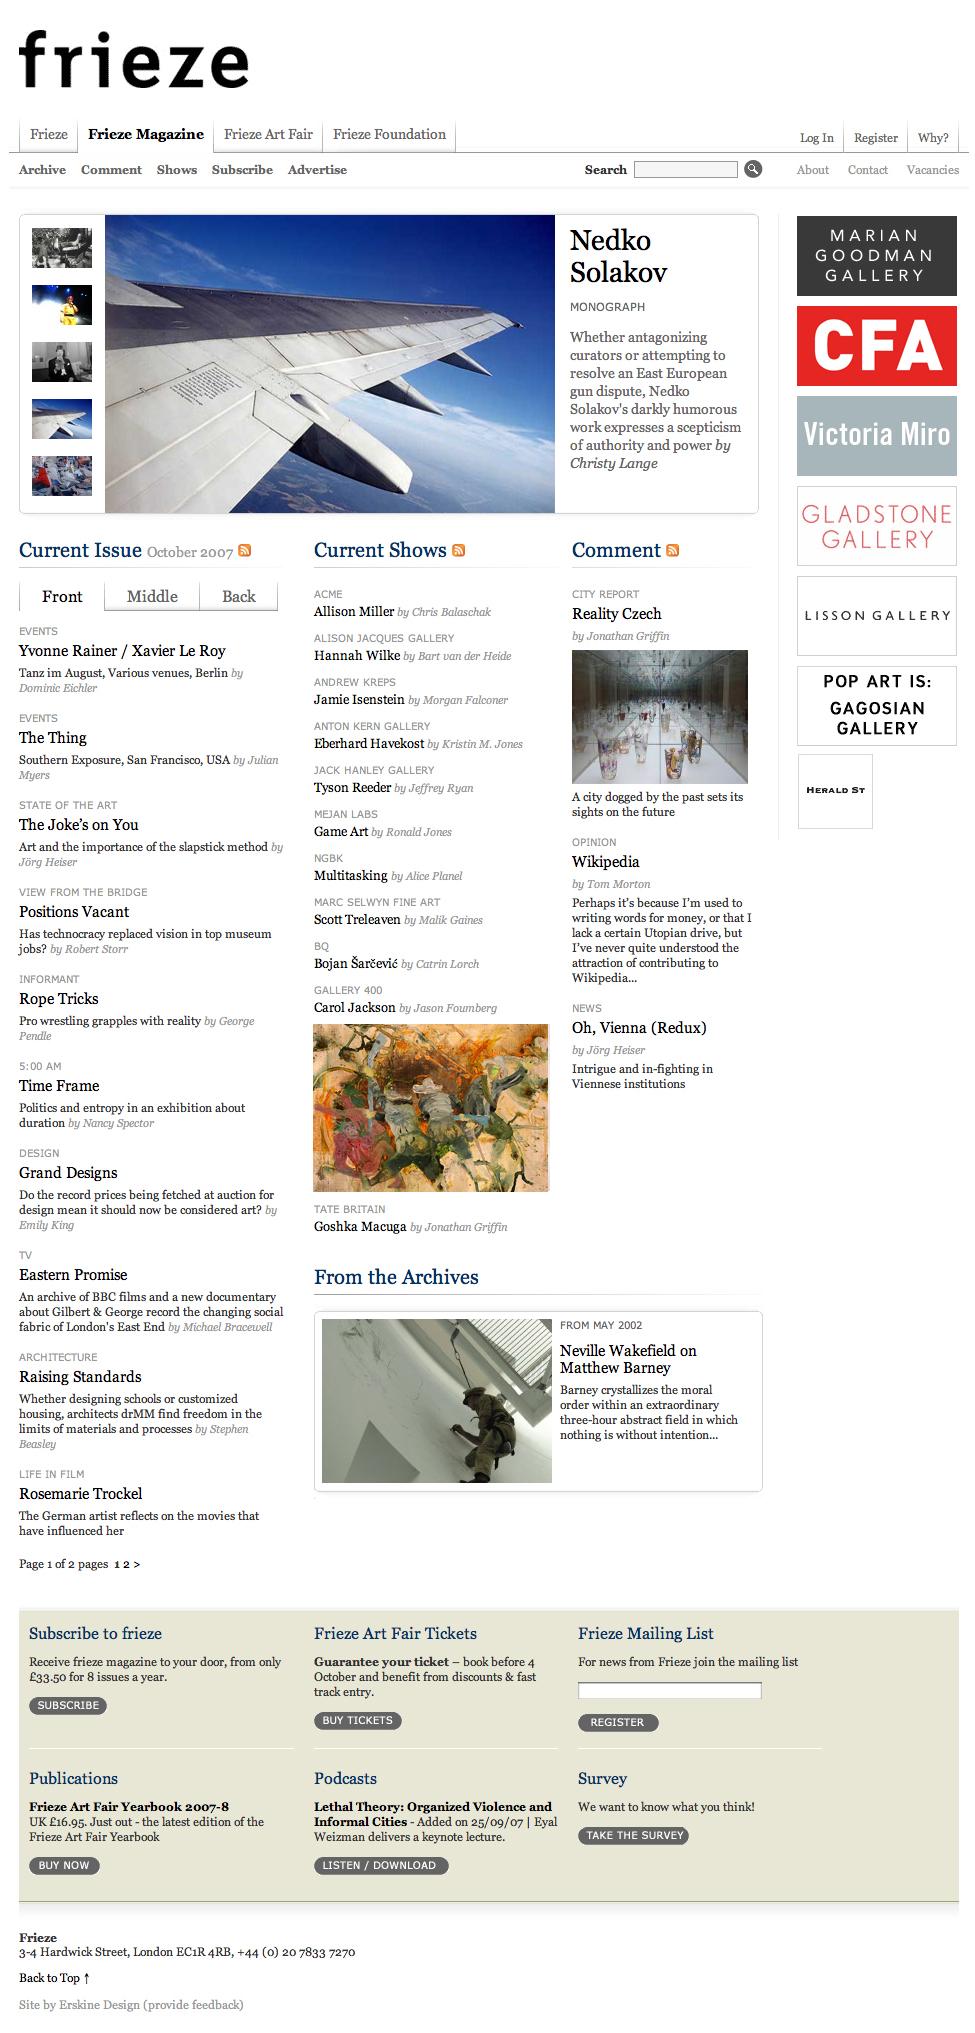 frieze magazine redesign 2007